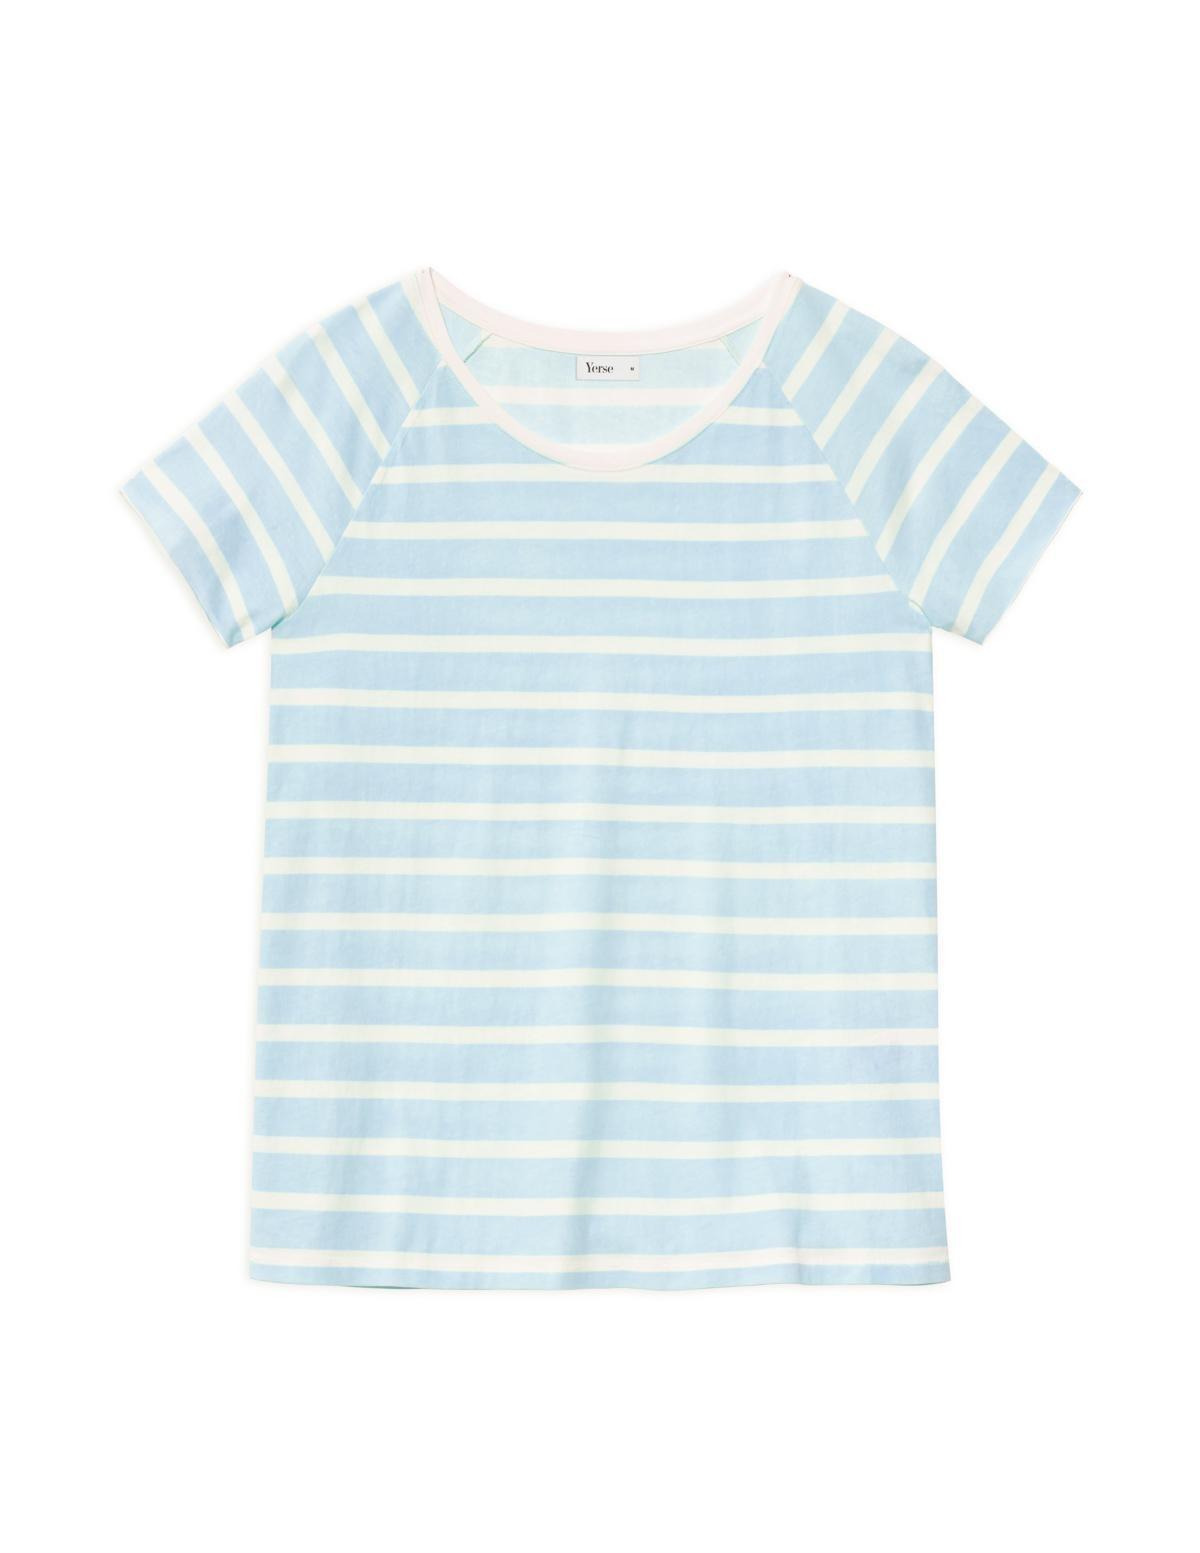 Set 3 camisetas manga corta algodón orgánico - Ítem1